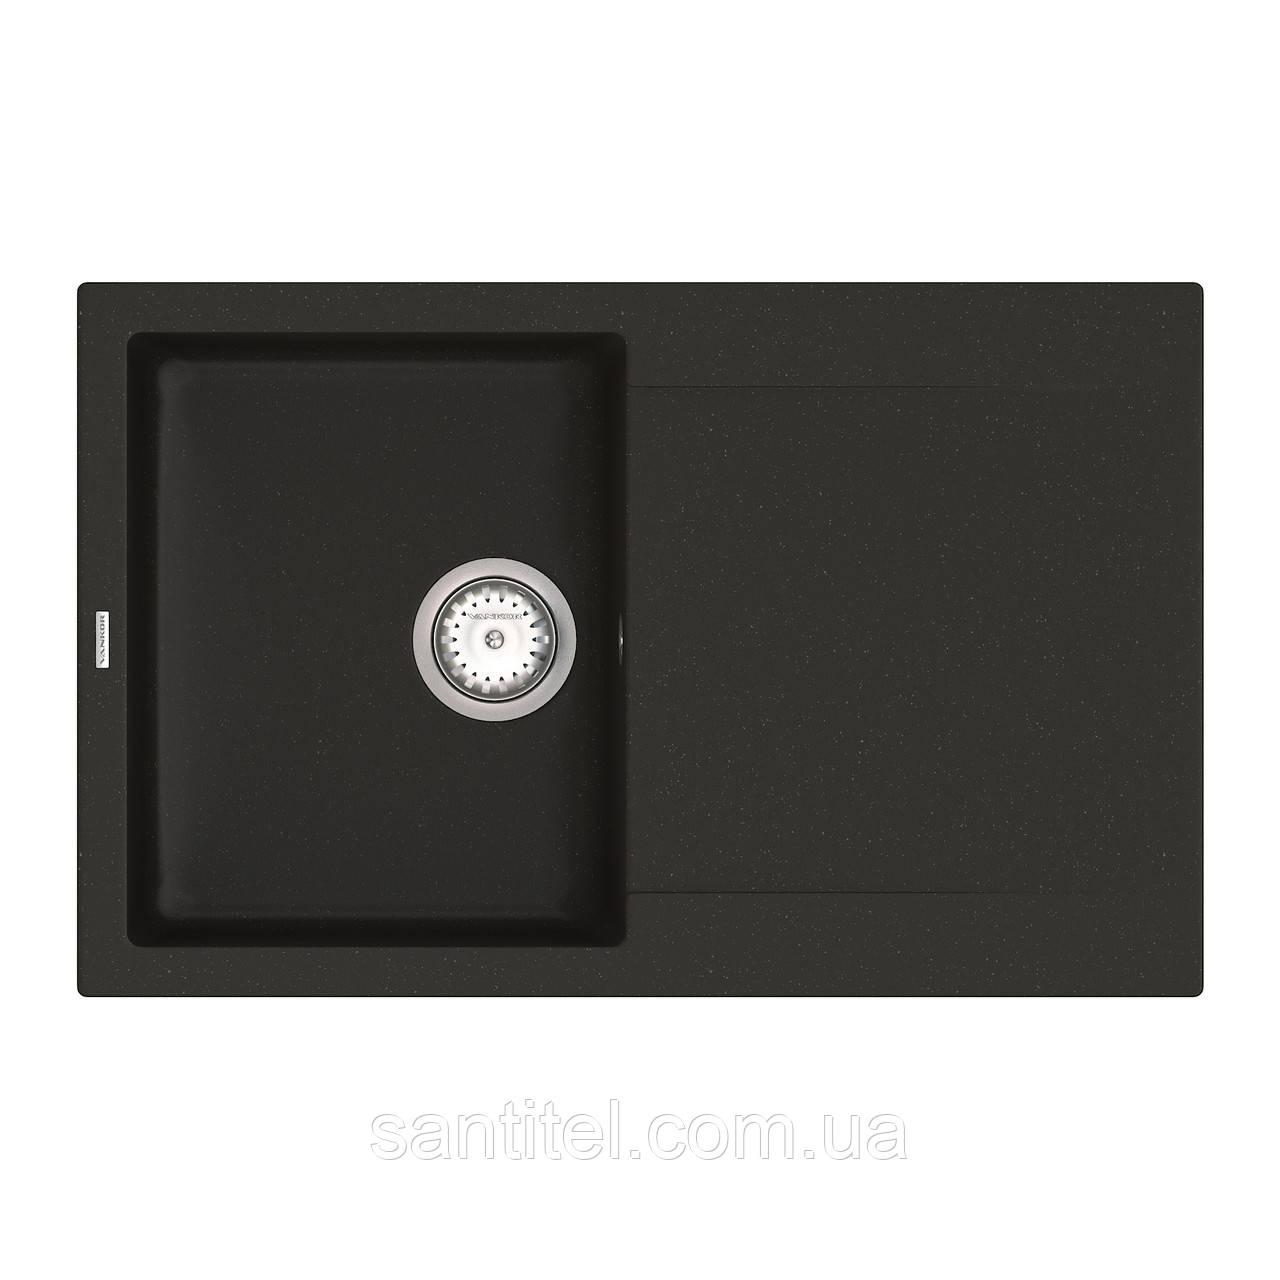 Кухонная мойка VANKOR Orman OMP 02.78 Black + сифон VANKOR